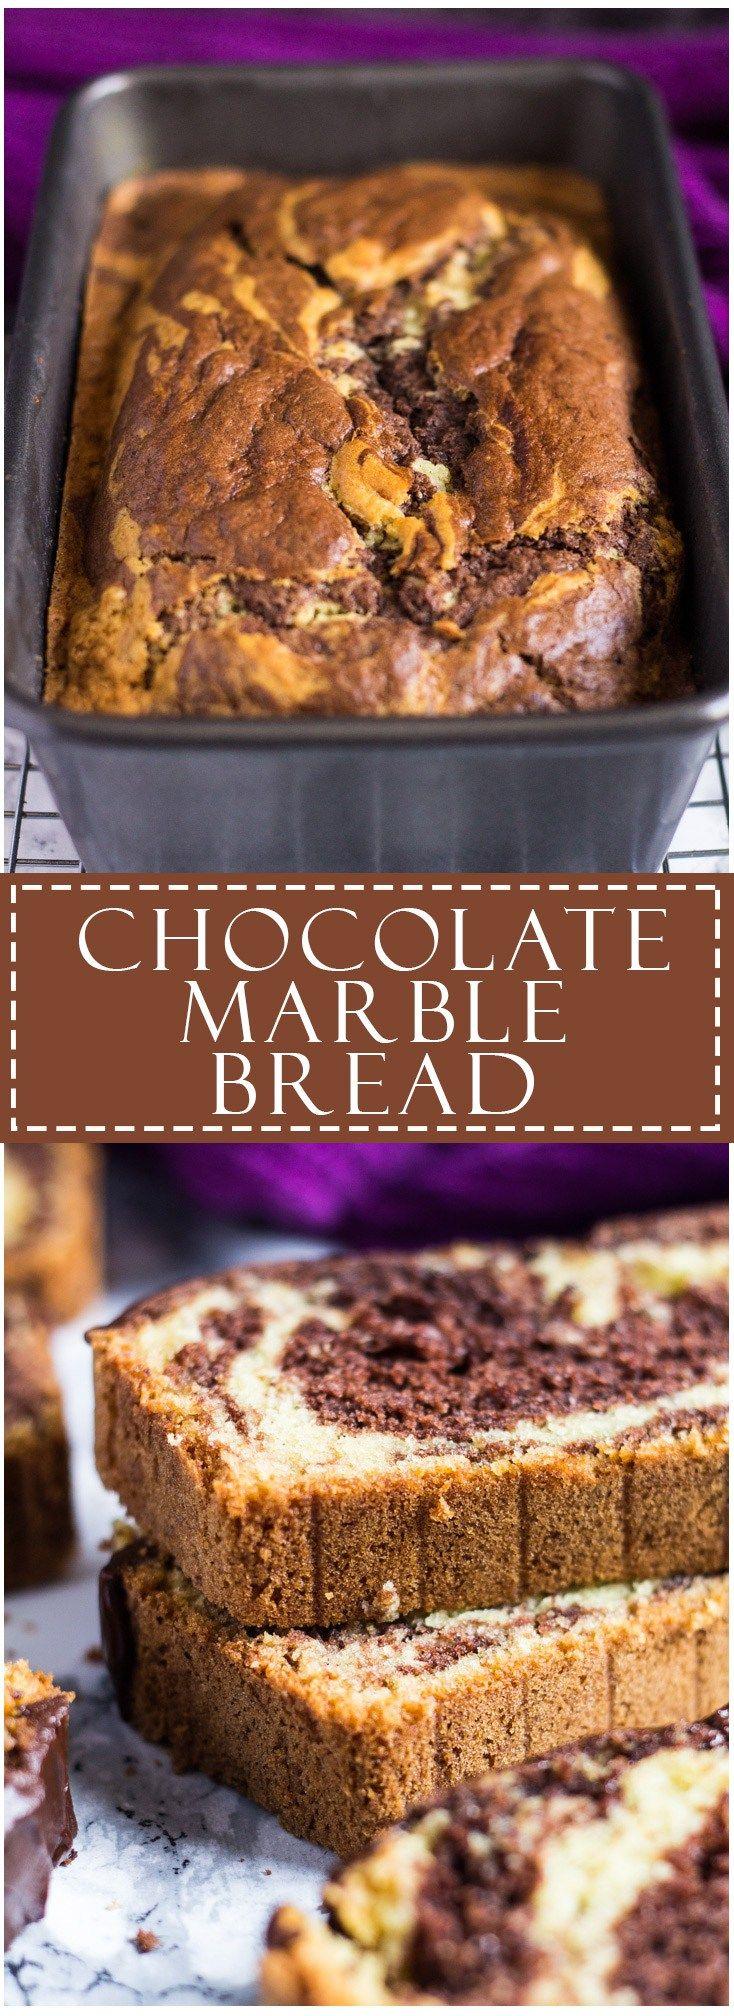 Chocolate Marble Bread   Marsha's Baking Addiction